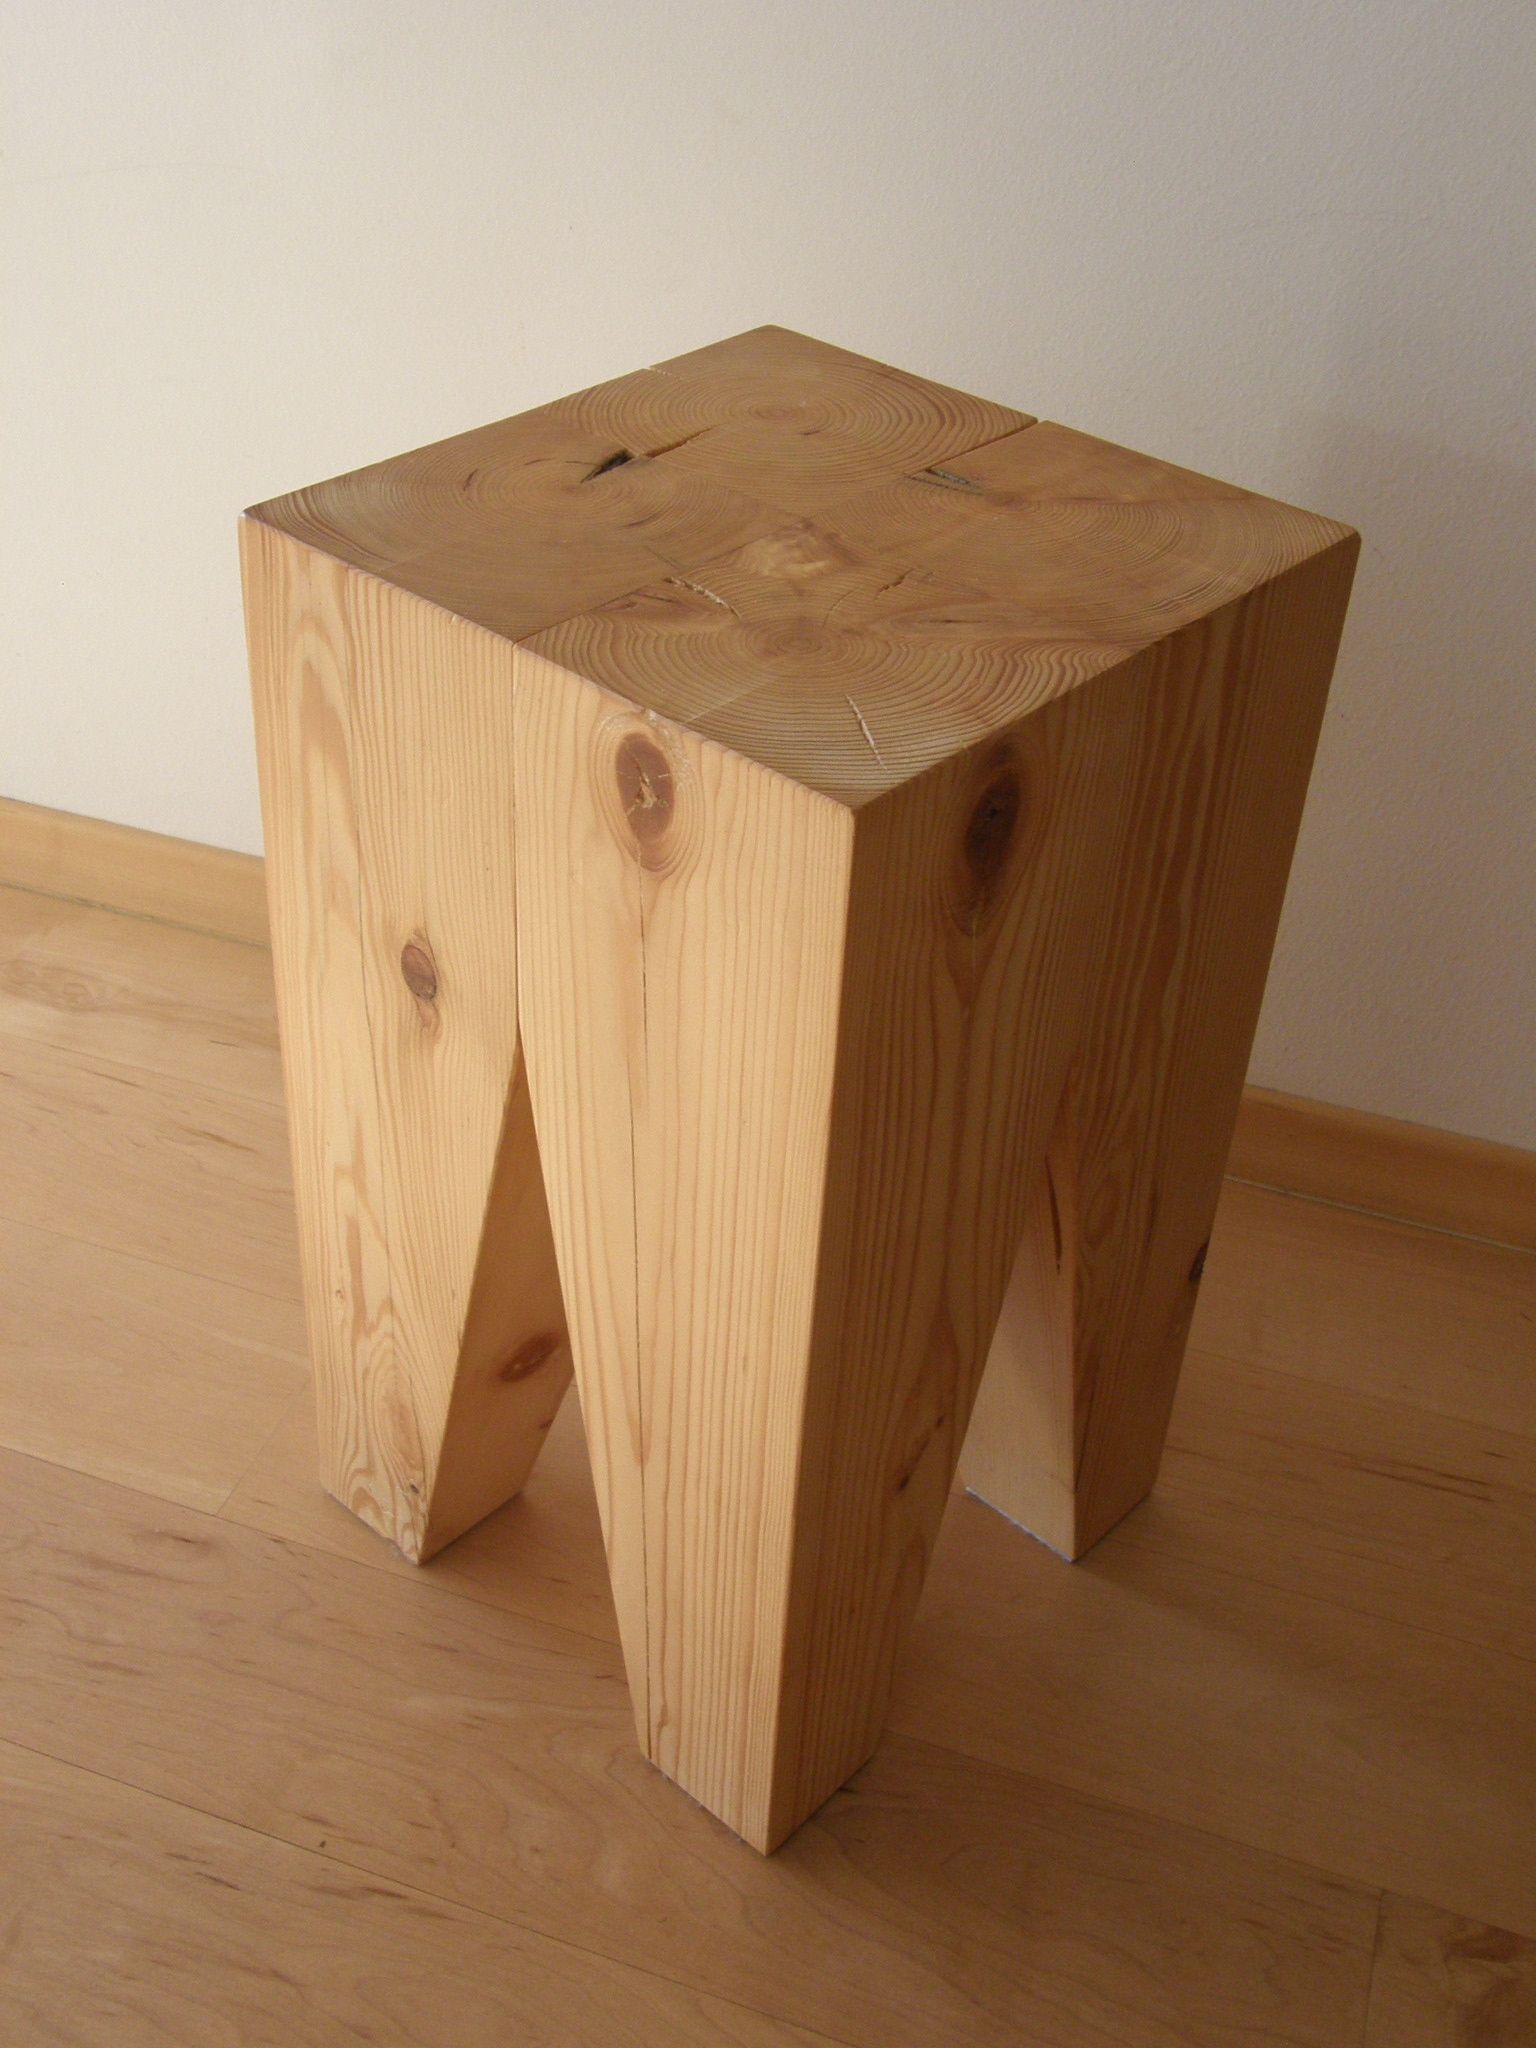 Pin von twelfa auf diy reclaimed raw solid wood - Vintage holzmobel ...